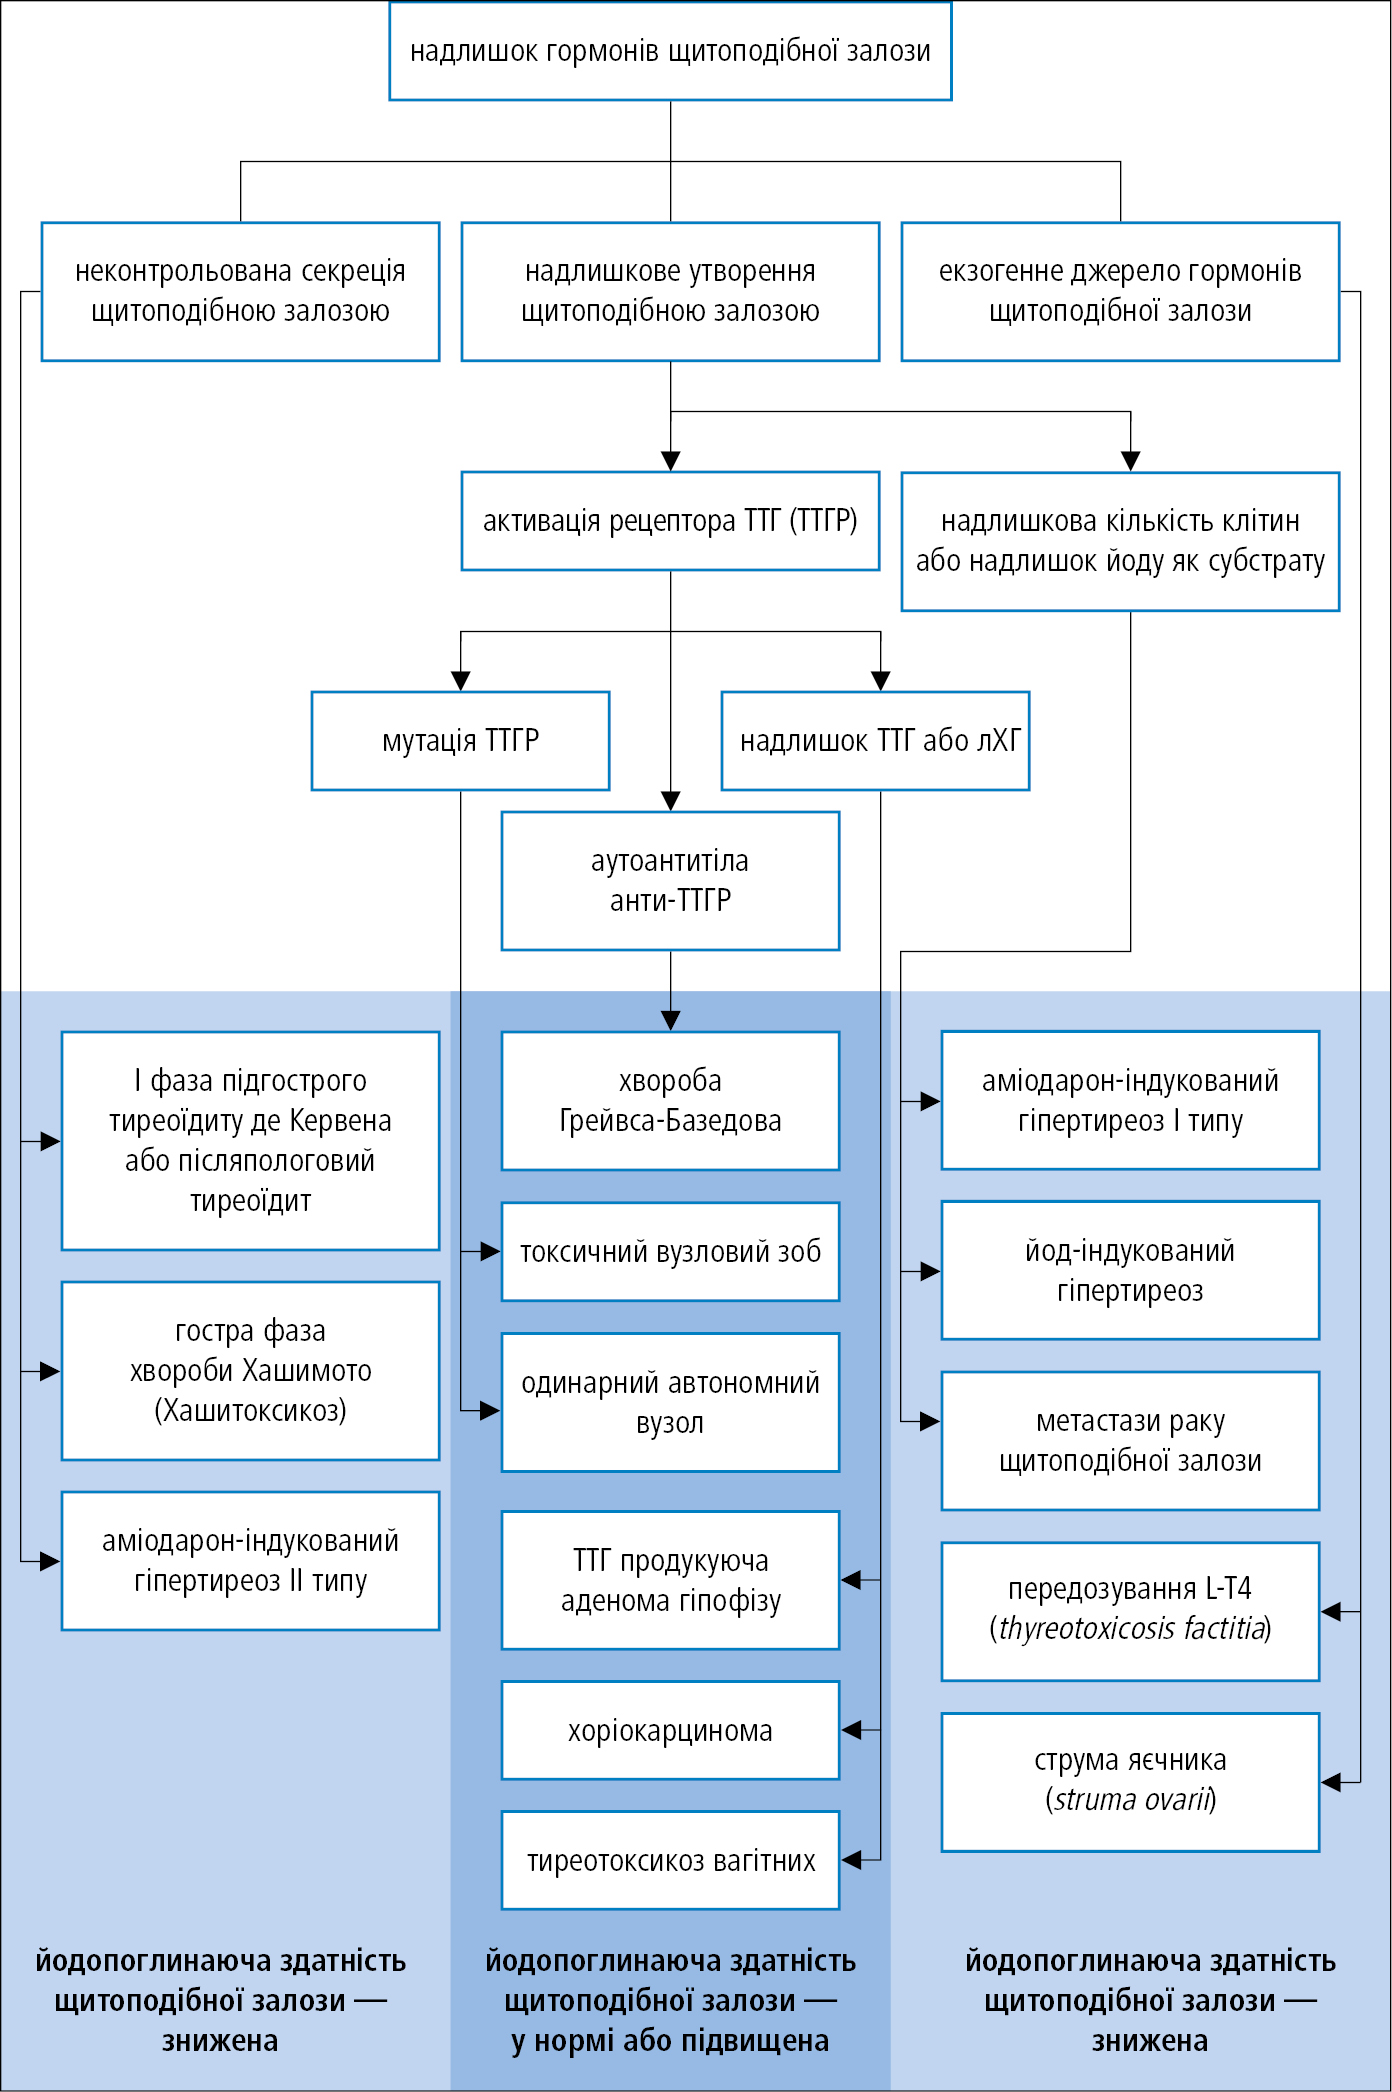 Причини гіпертиреозу